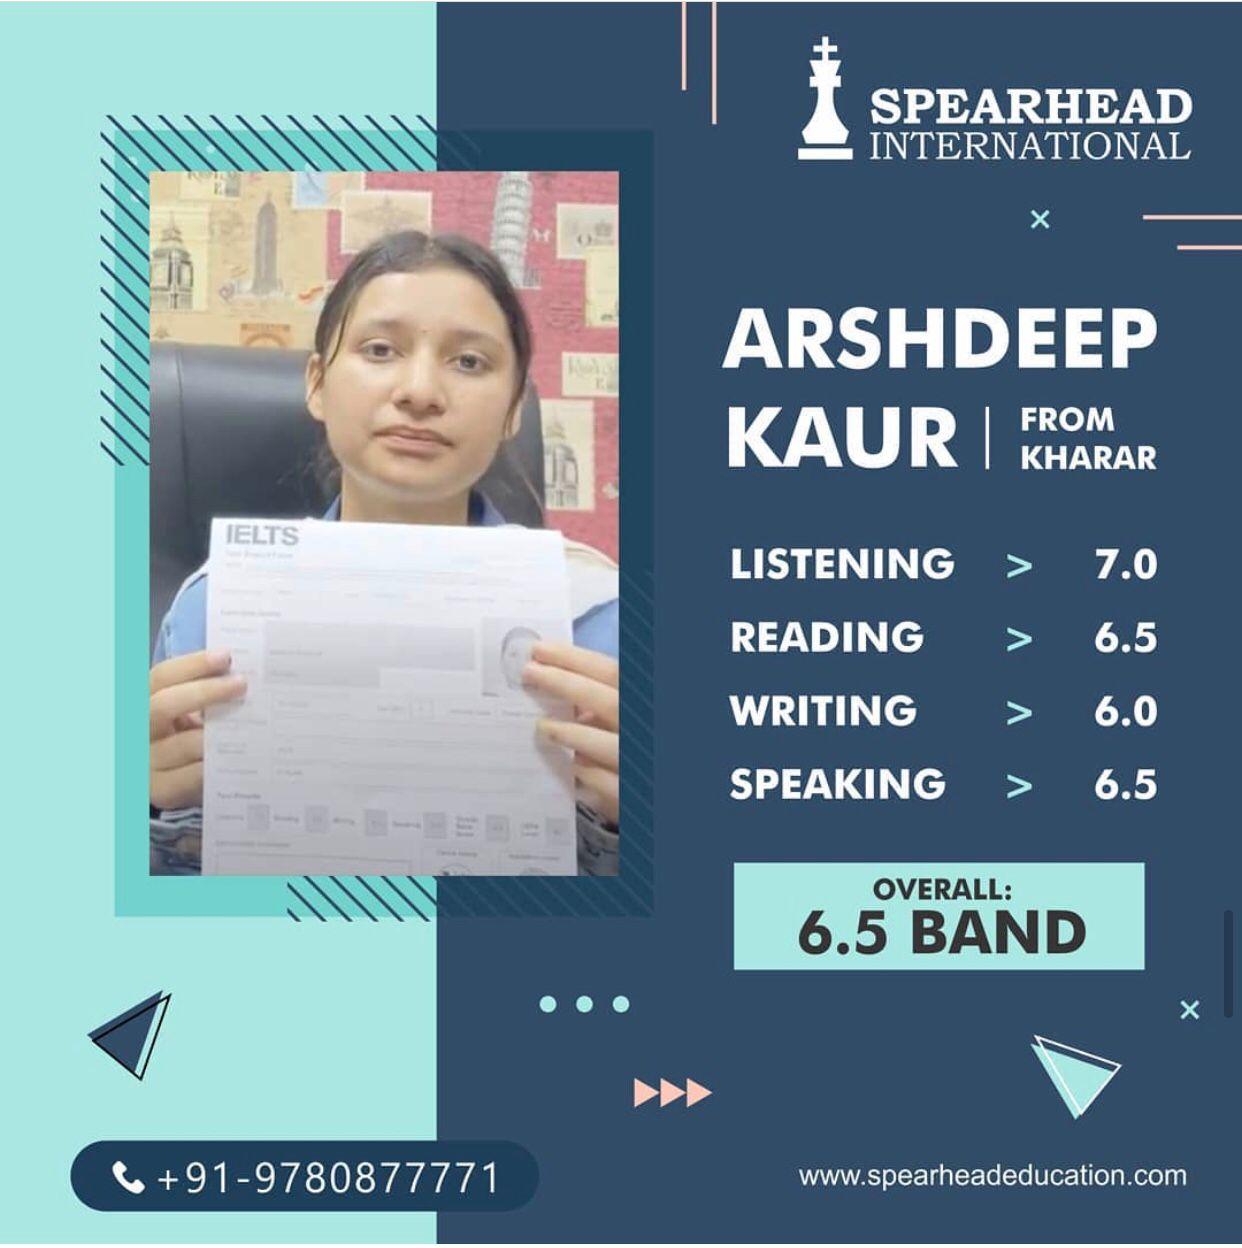 Spearhead International Images